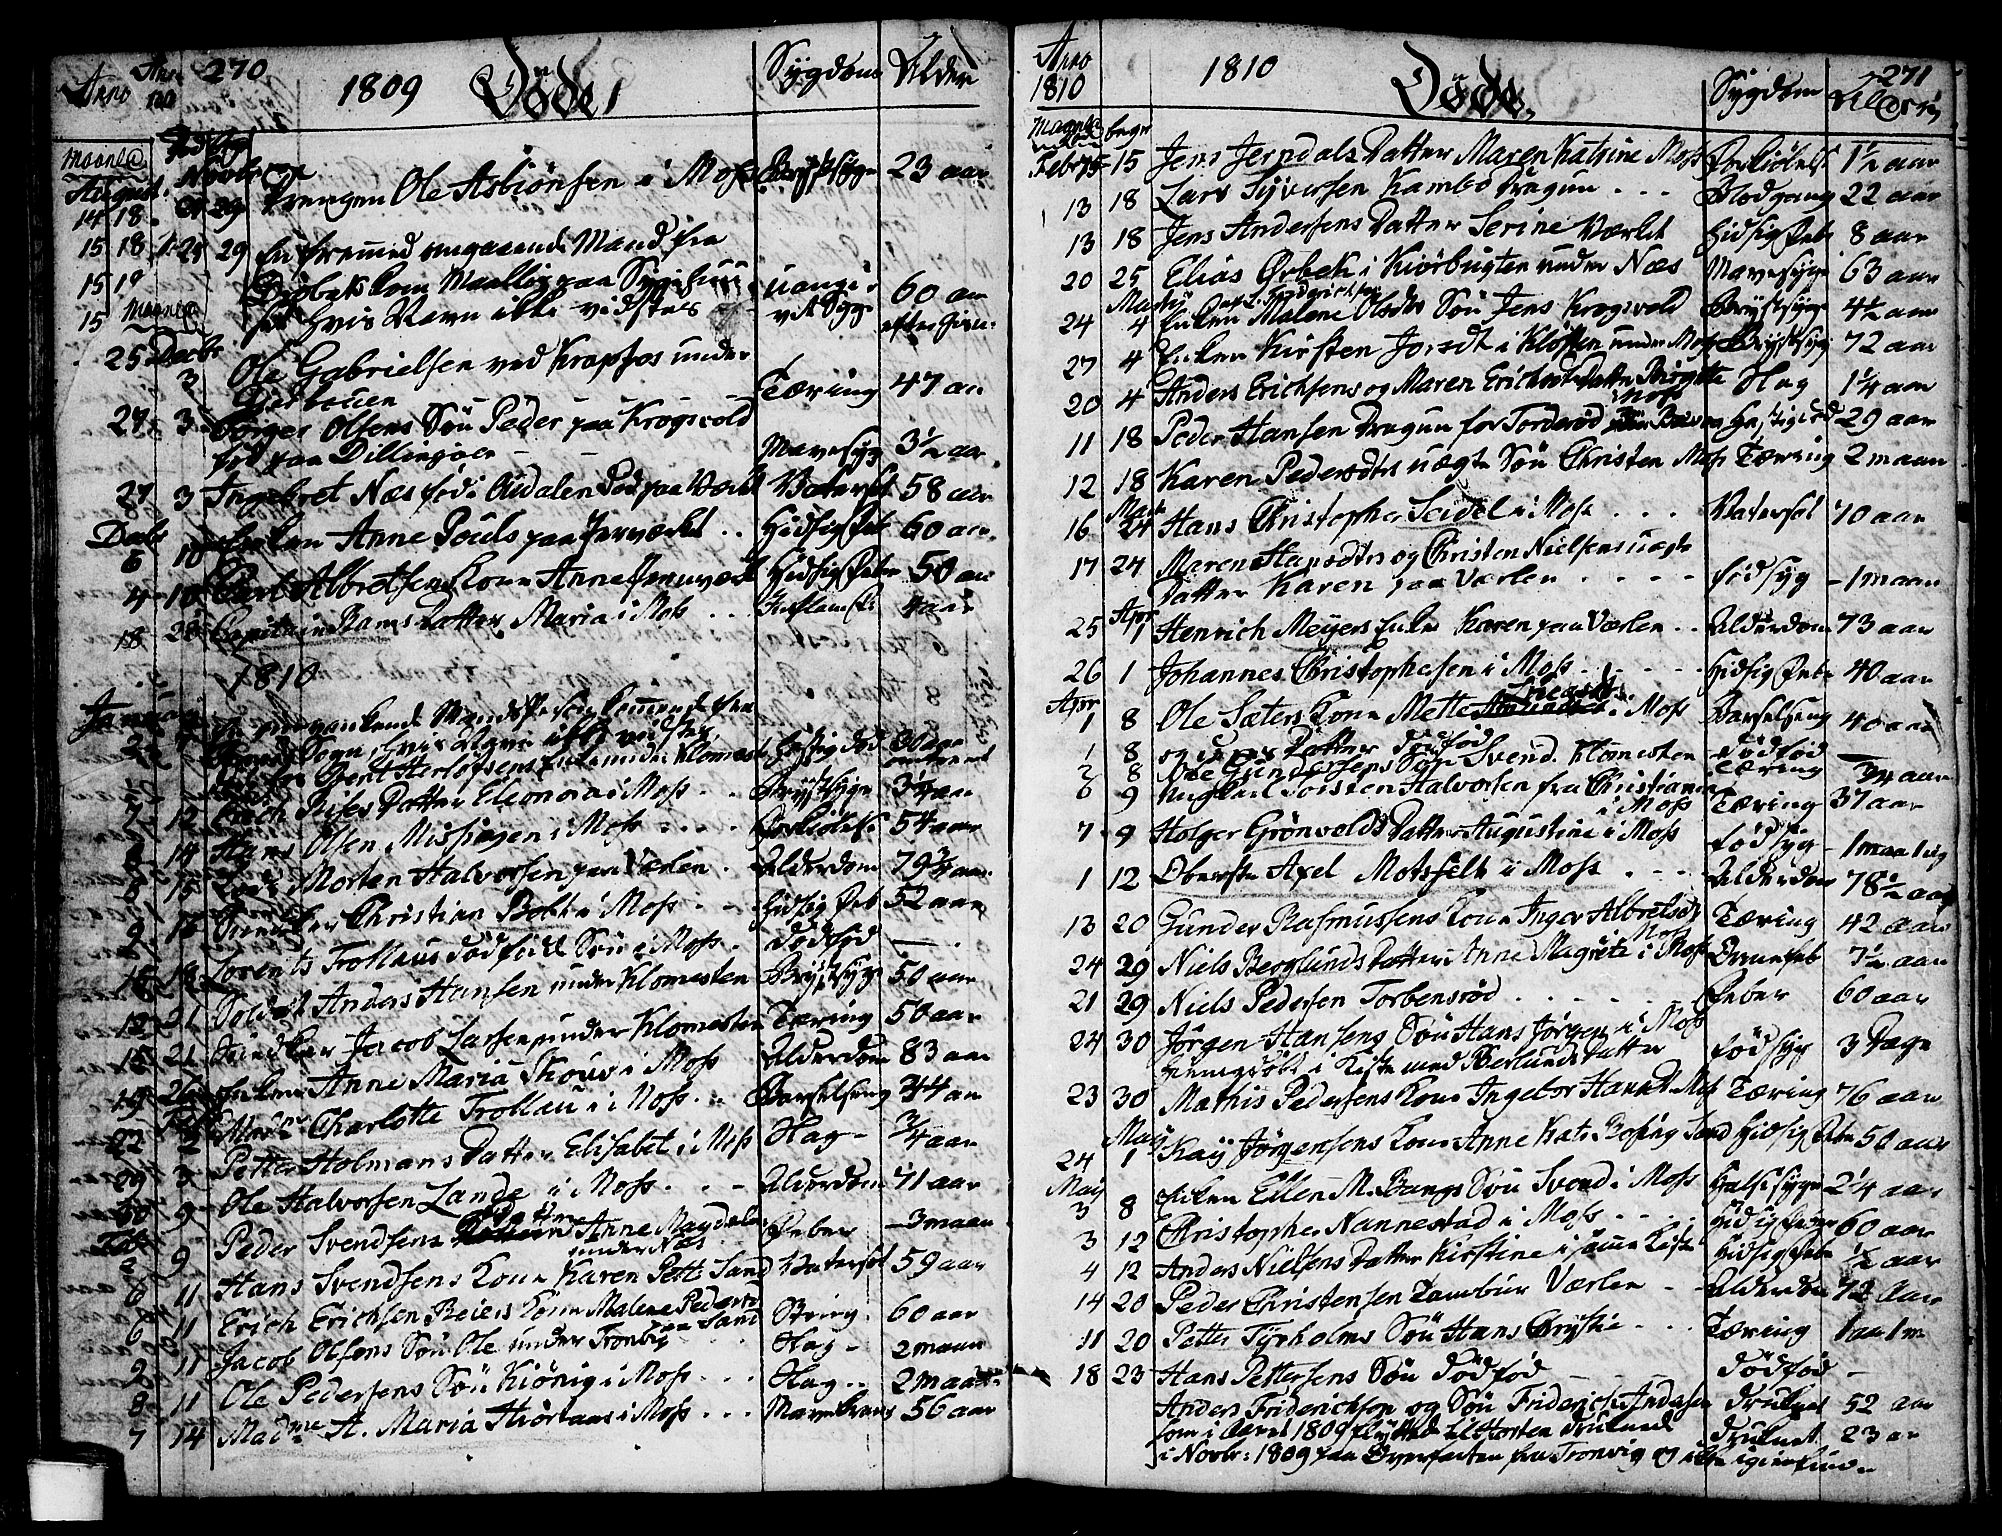 SAO, Moss prestekontor Kirkebøker, F/Fa/Faa/L0003: Ministerialbok nr. I 3, 1779-1814, s. 270-271